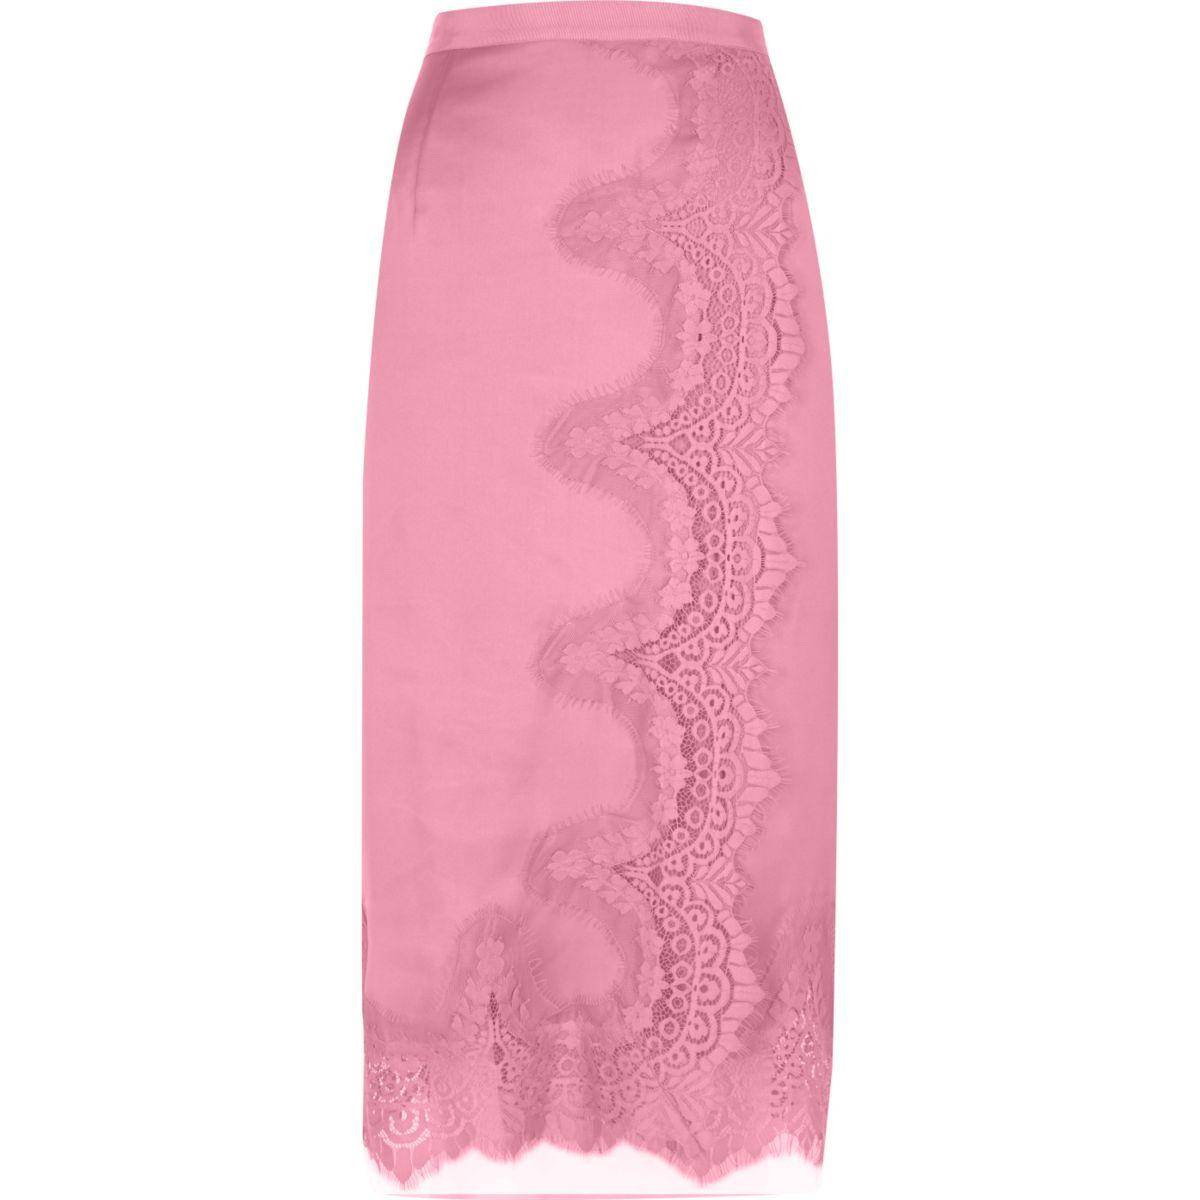 Pink scalloped eyelash lace midi wrap skirt